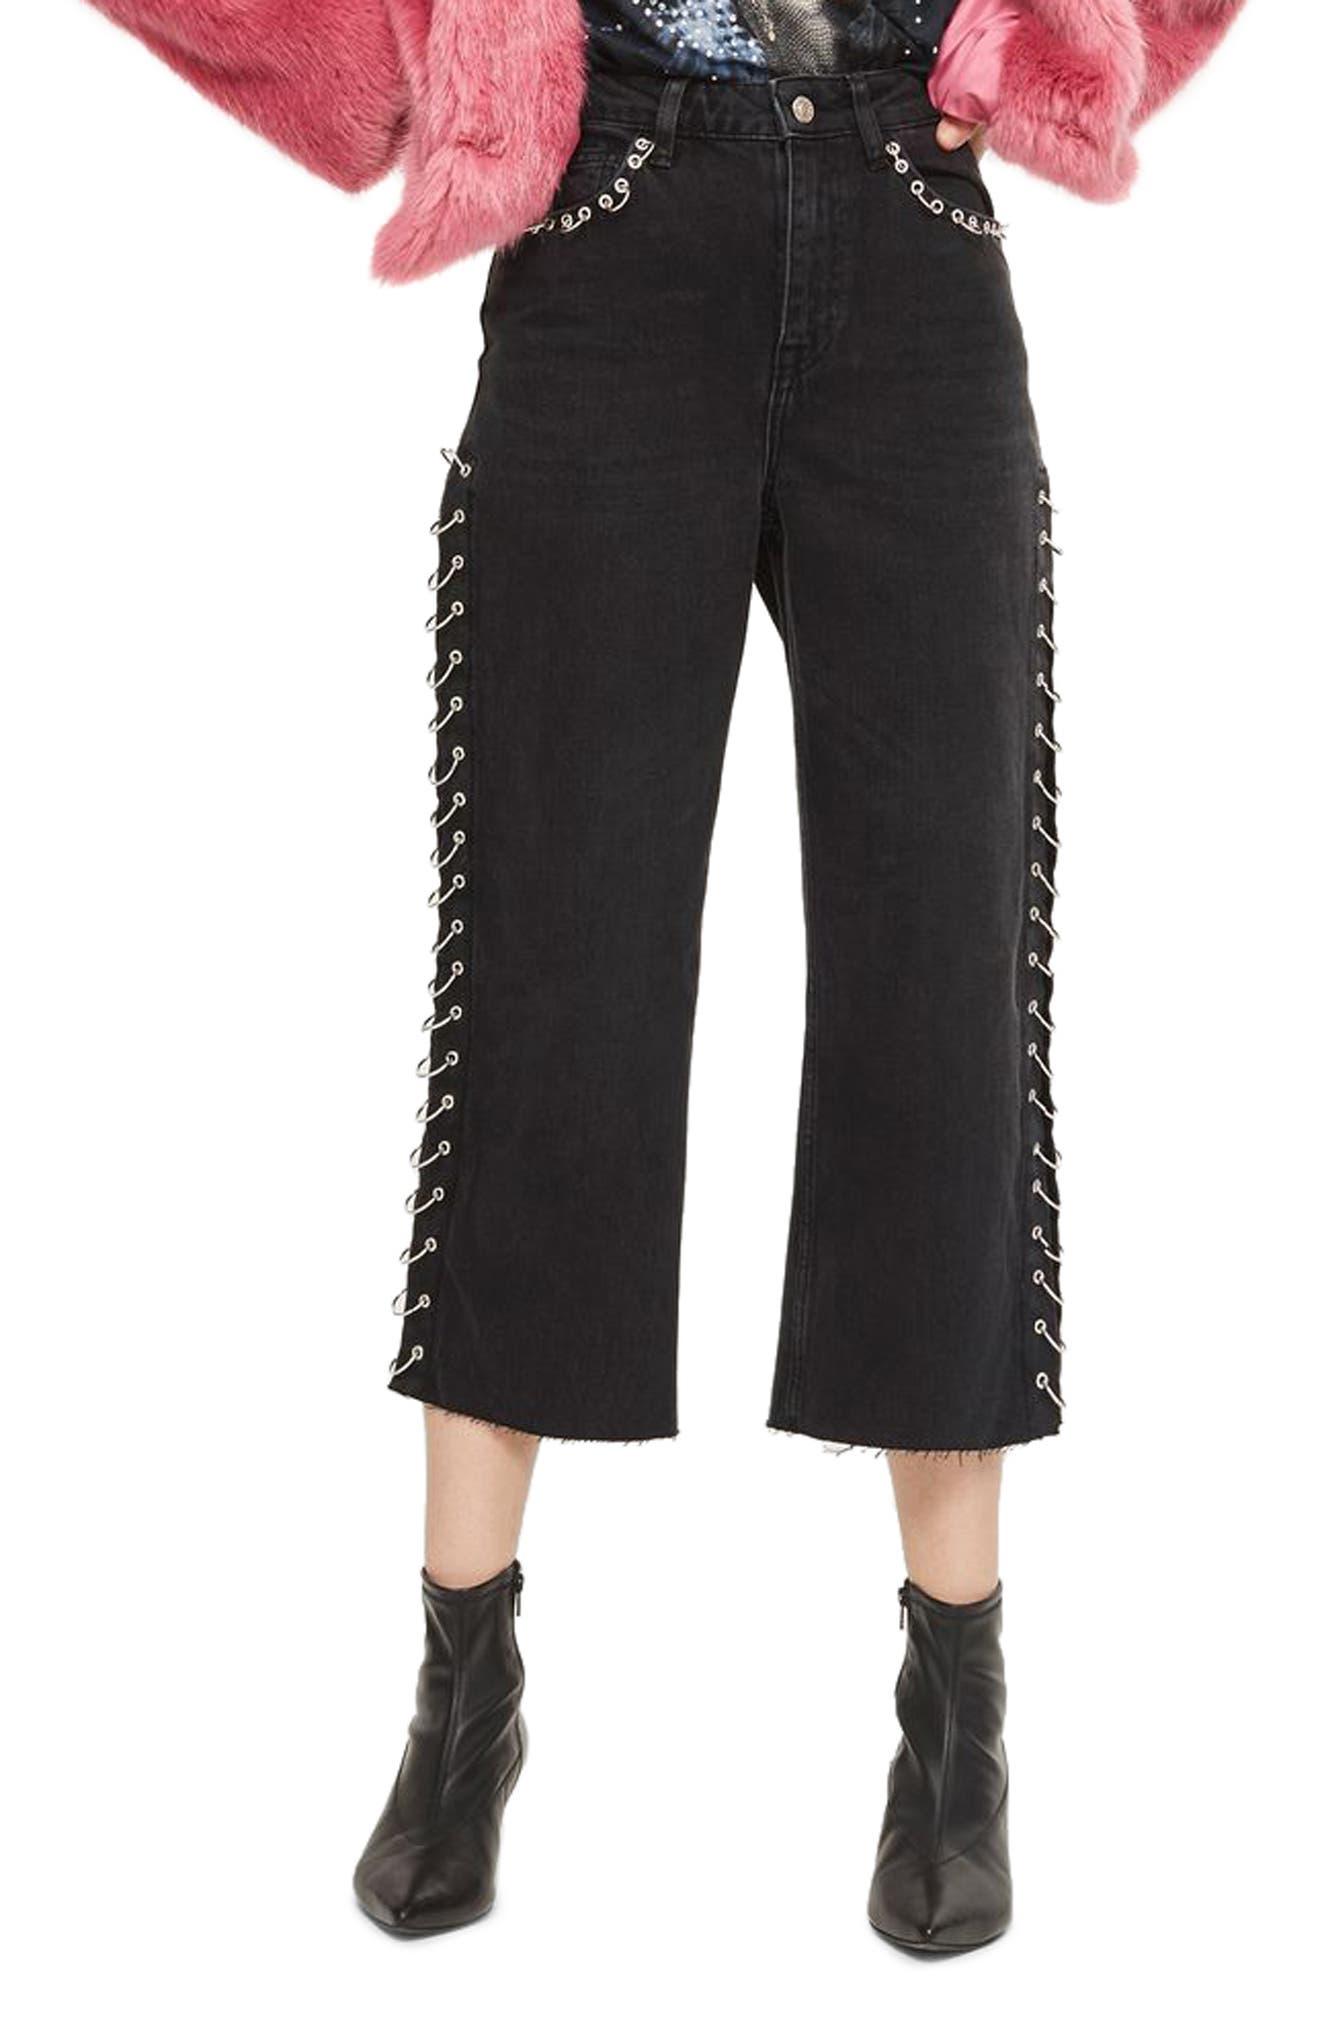 Alternate Image 1 Selected - Topshop Pierced Crop Wide Leg Jeans